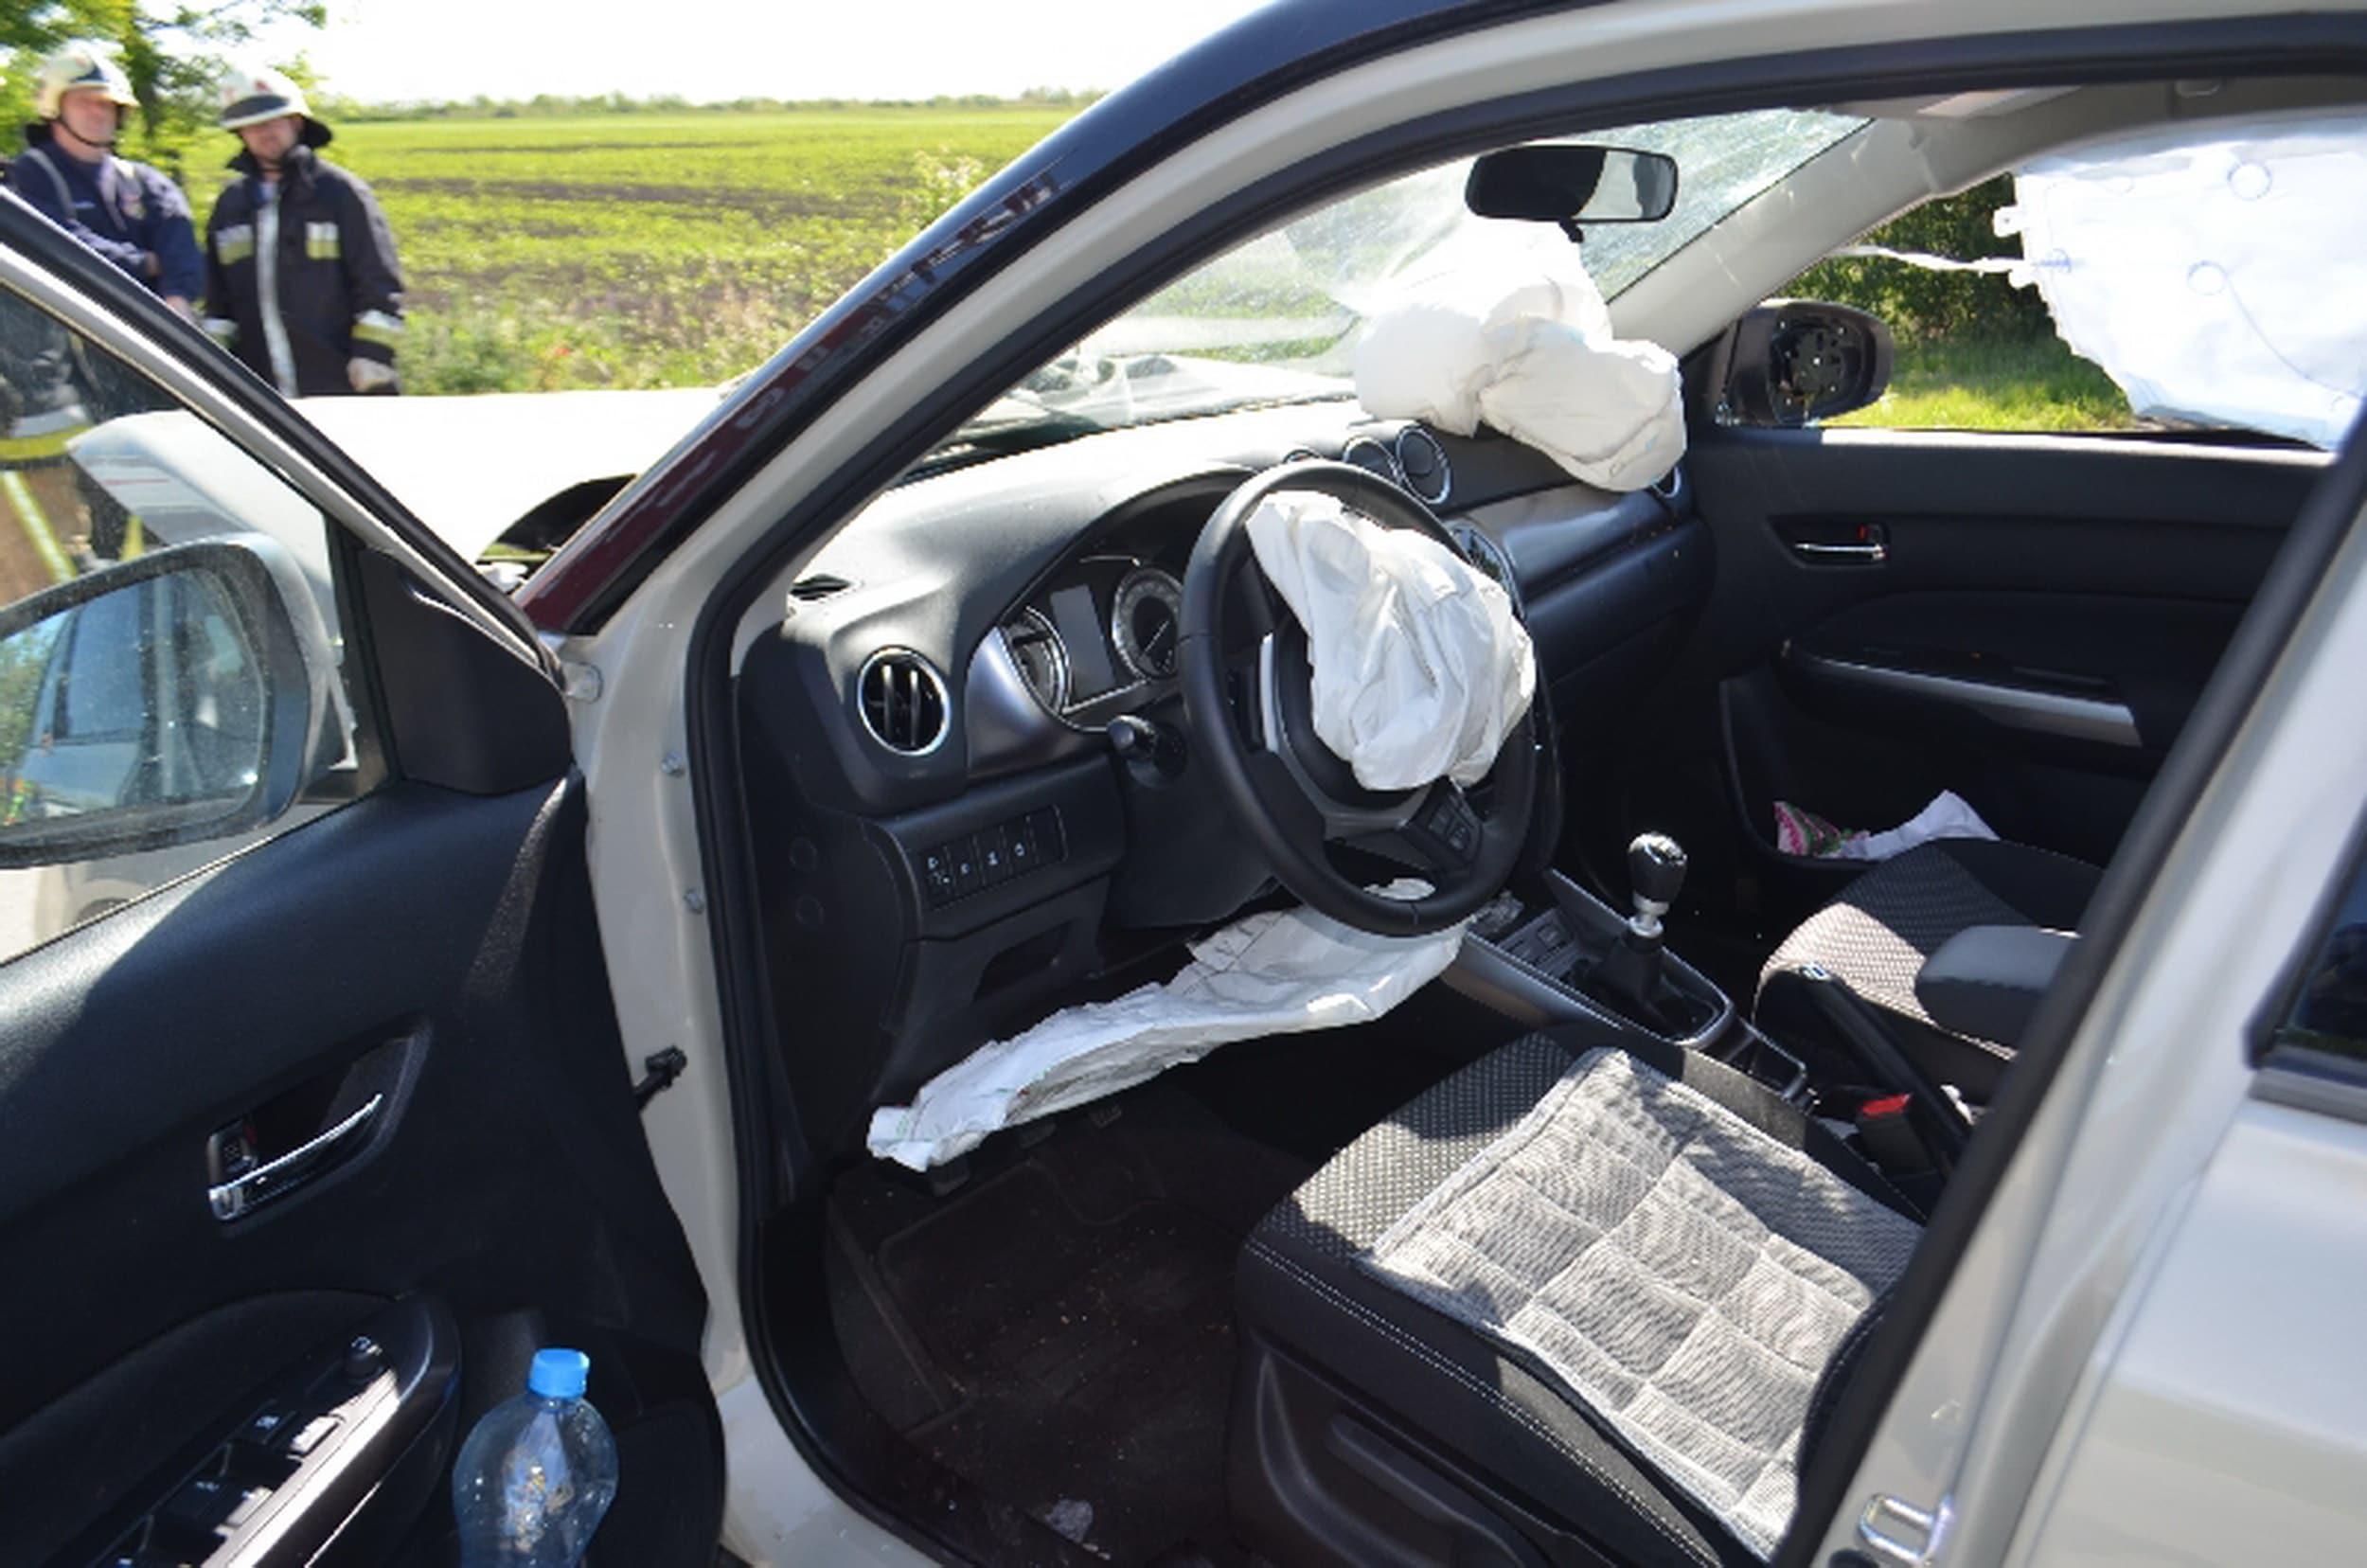 Ittas sofőrök okoztak baleseteket